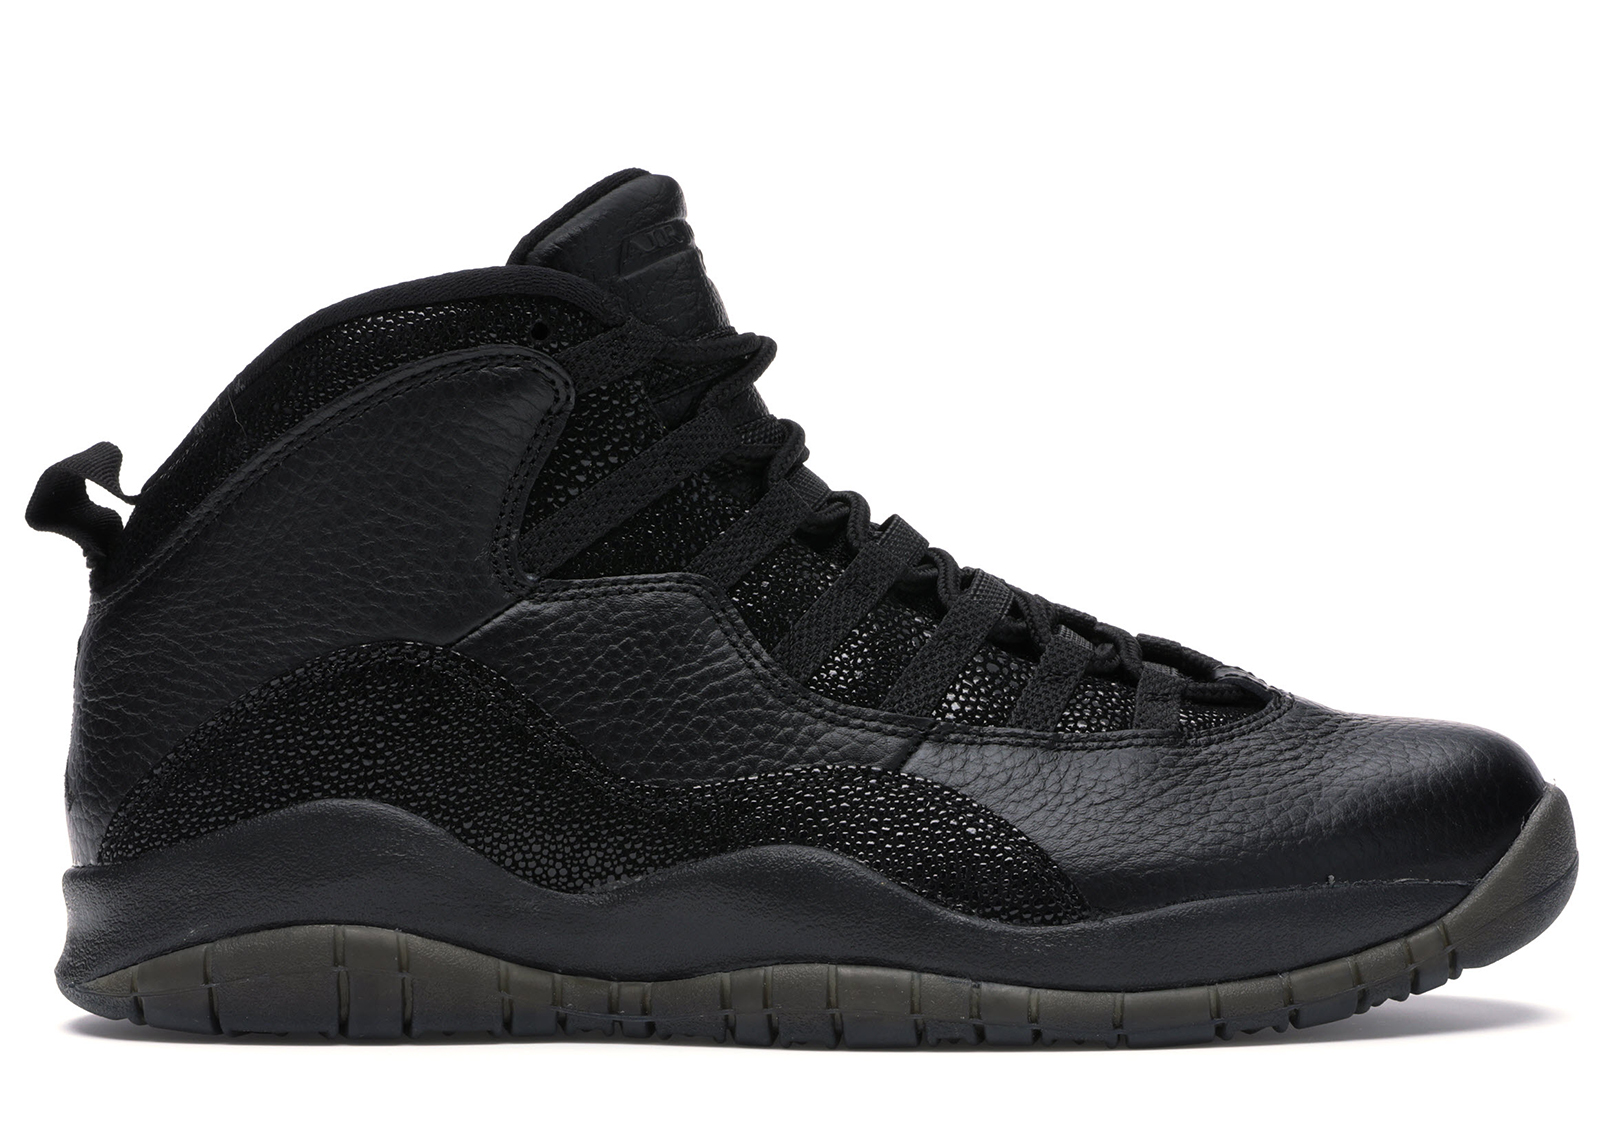 Jordan 10 Retro Drake OVO Black